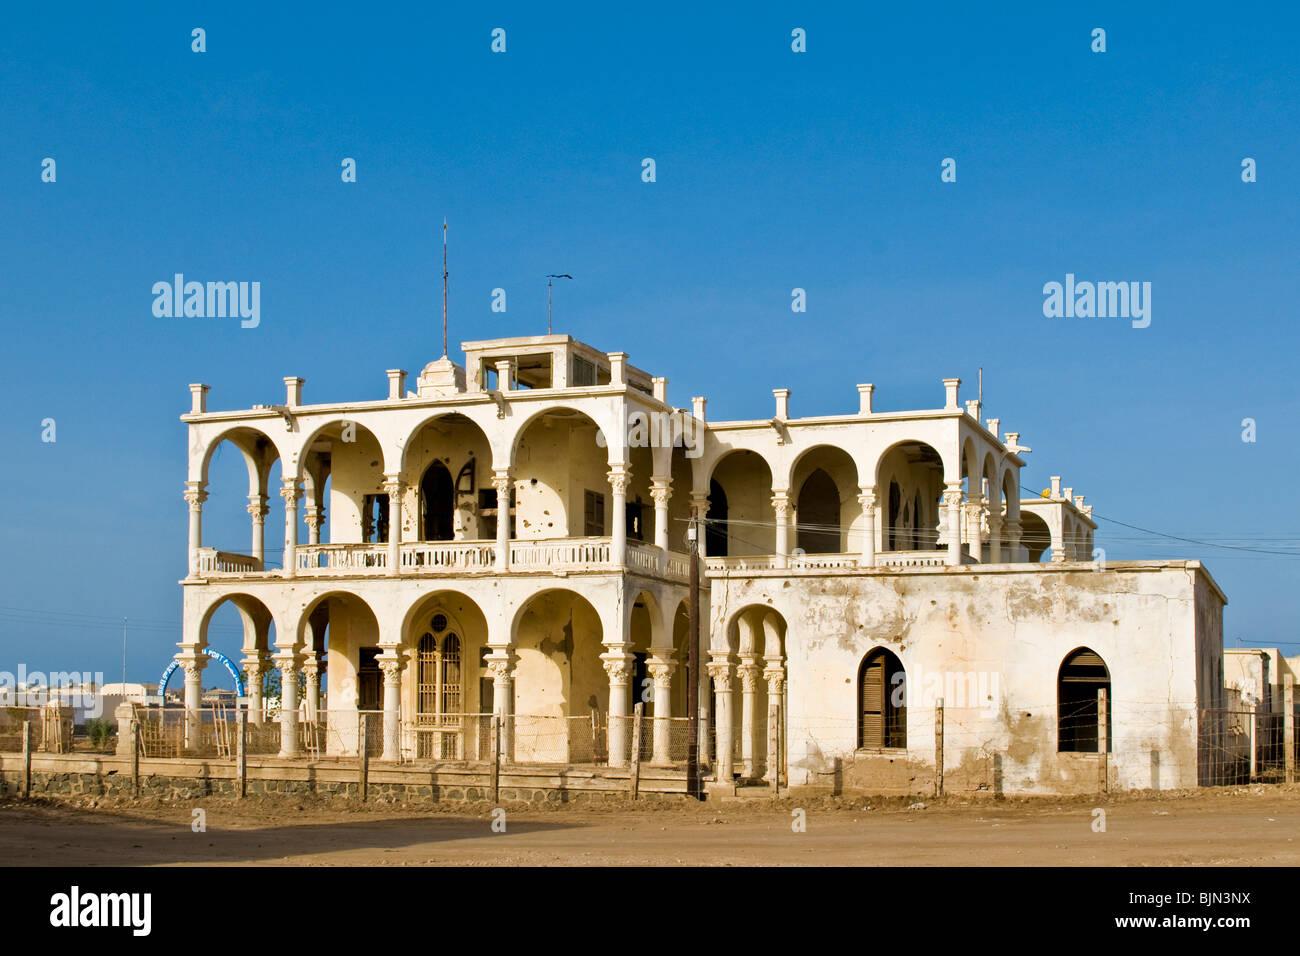 banco d'Italia, Italian bank, Massawa, Eritrea Stock Photo